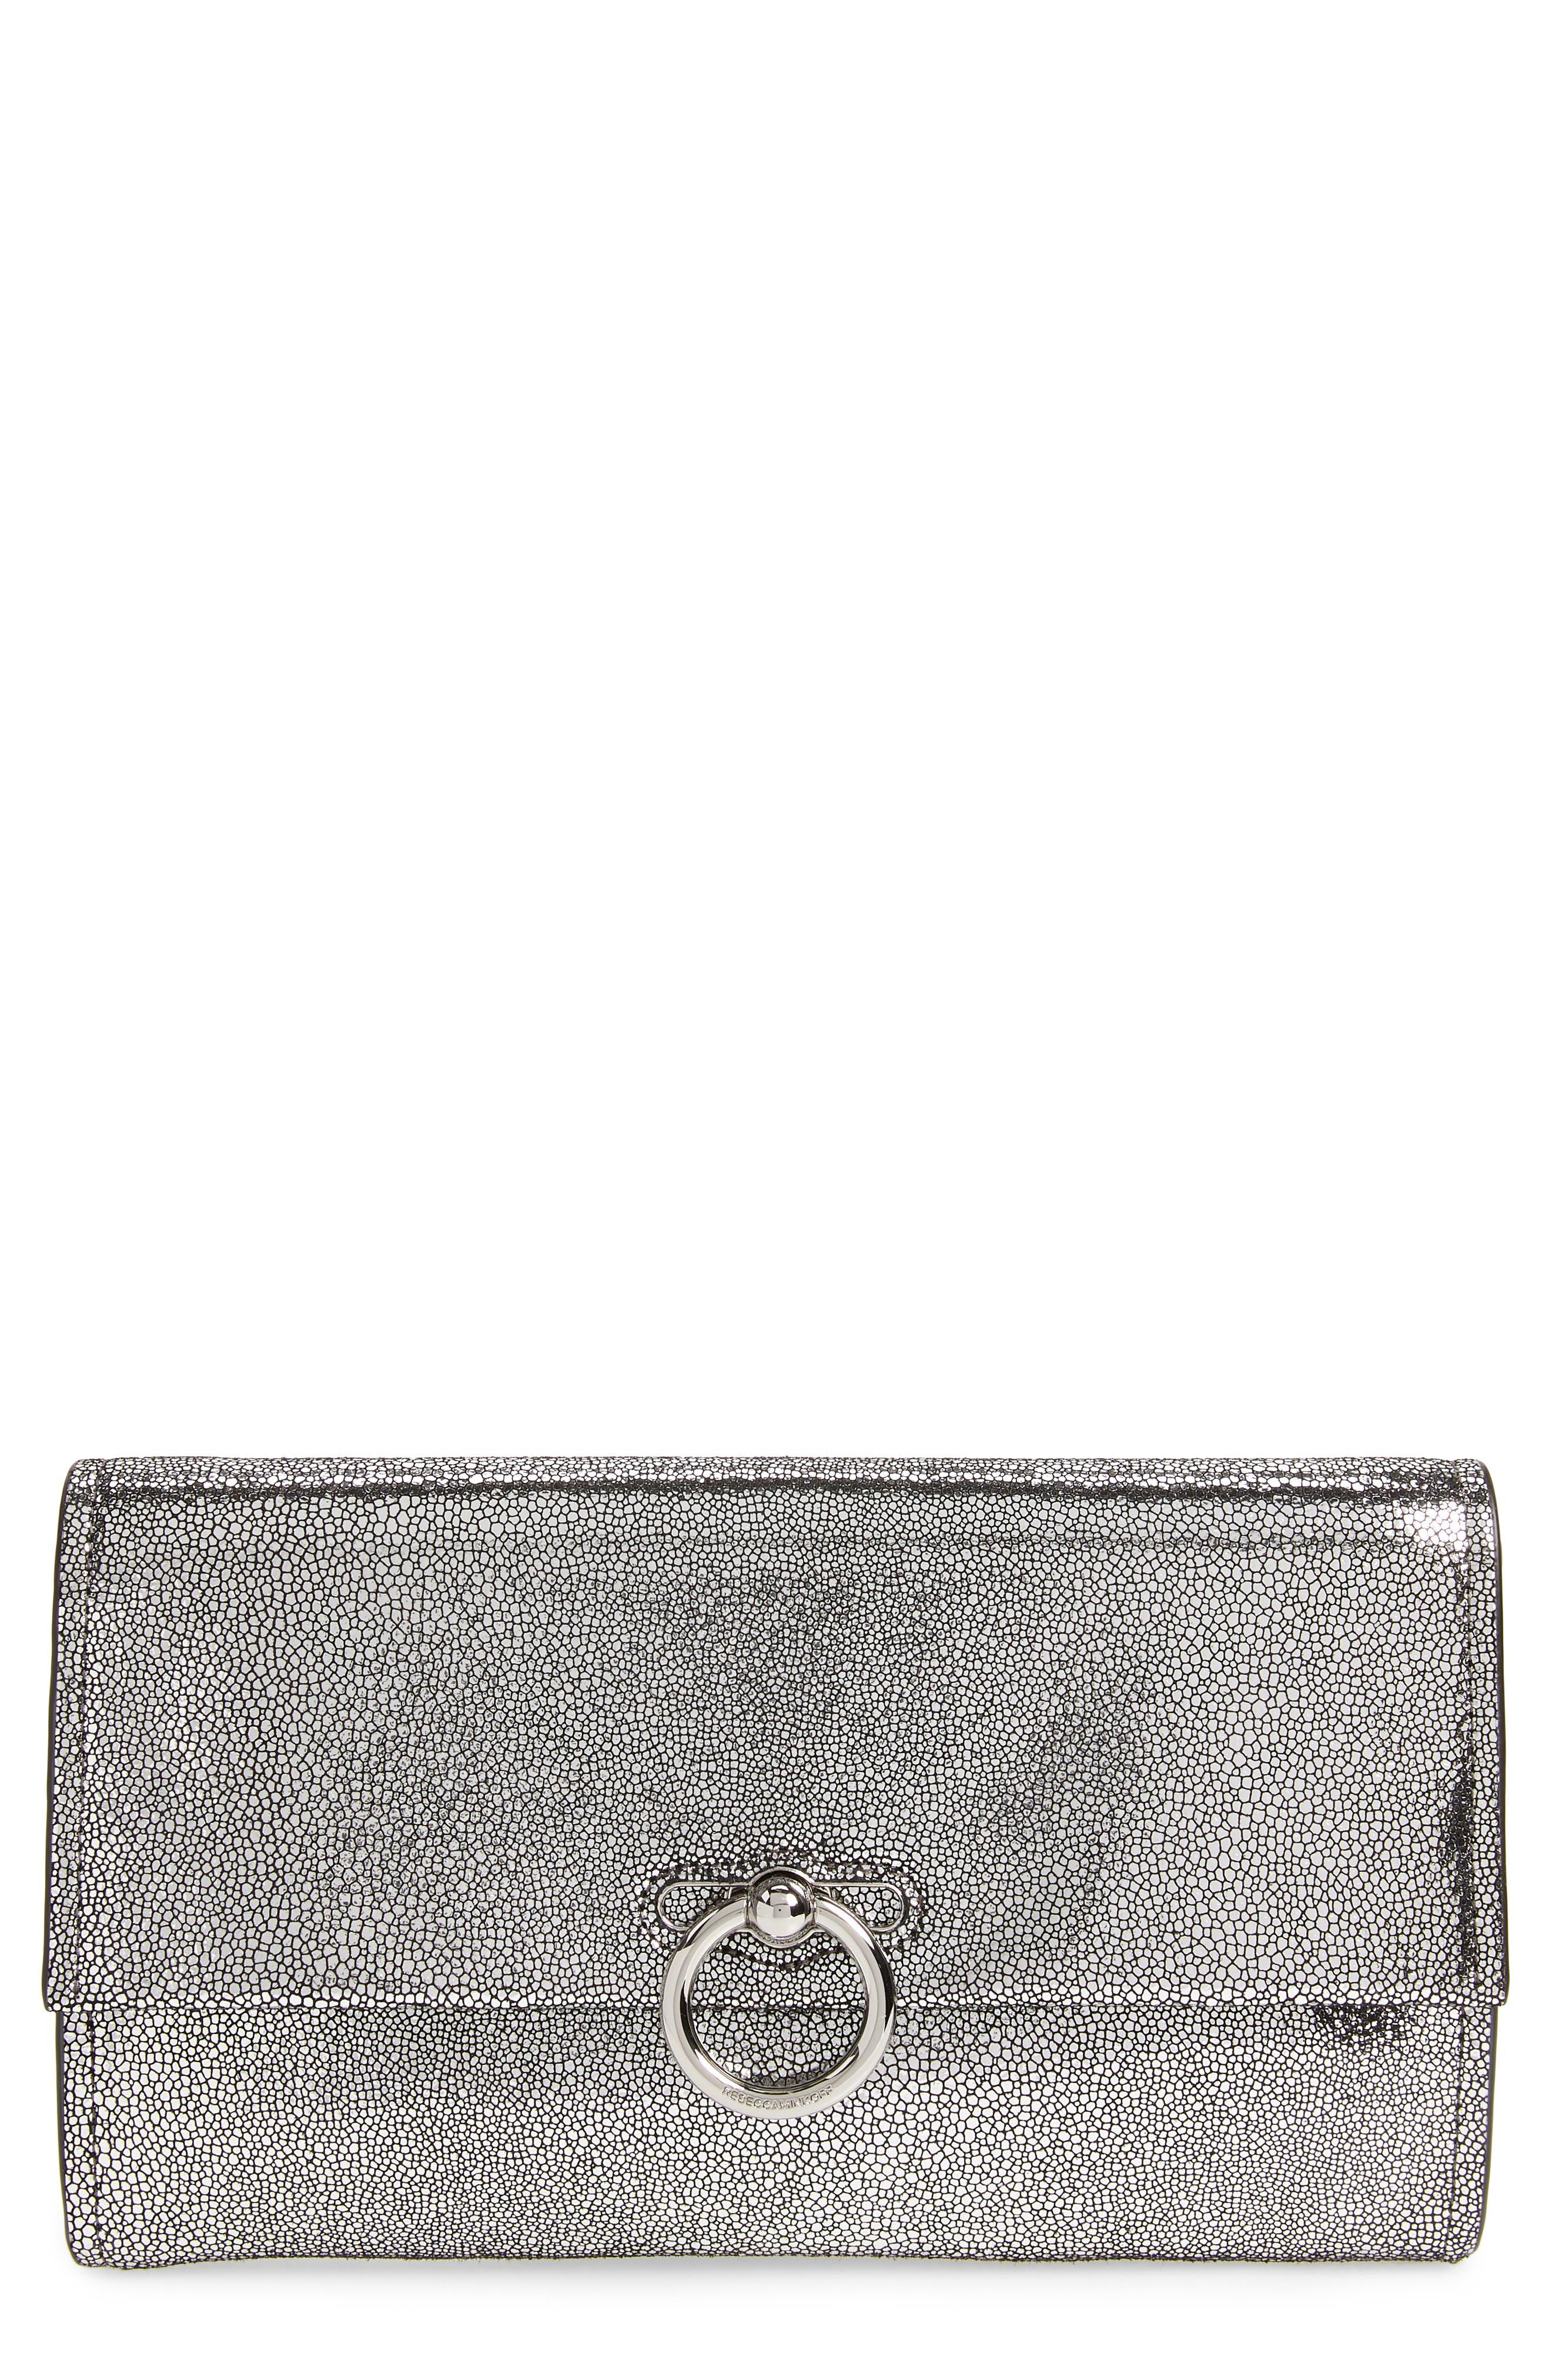 Jean Metallic Leather Clutch,                         Main,                         color, SILVER